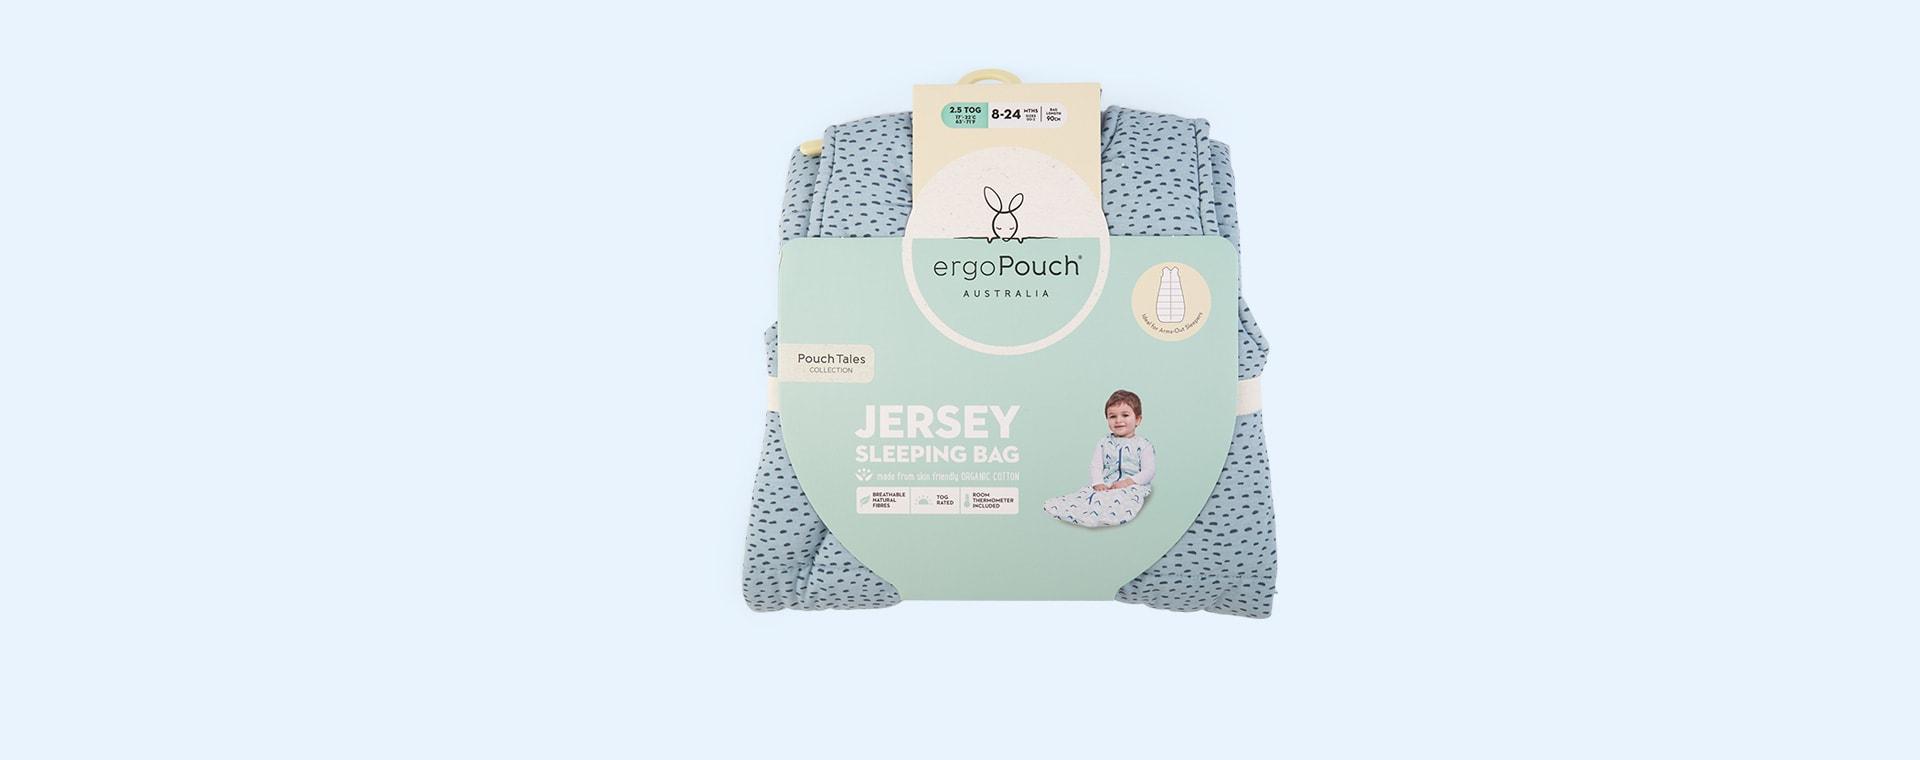 Pebble Ergopouch Jersey Sleeping Bag